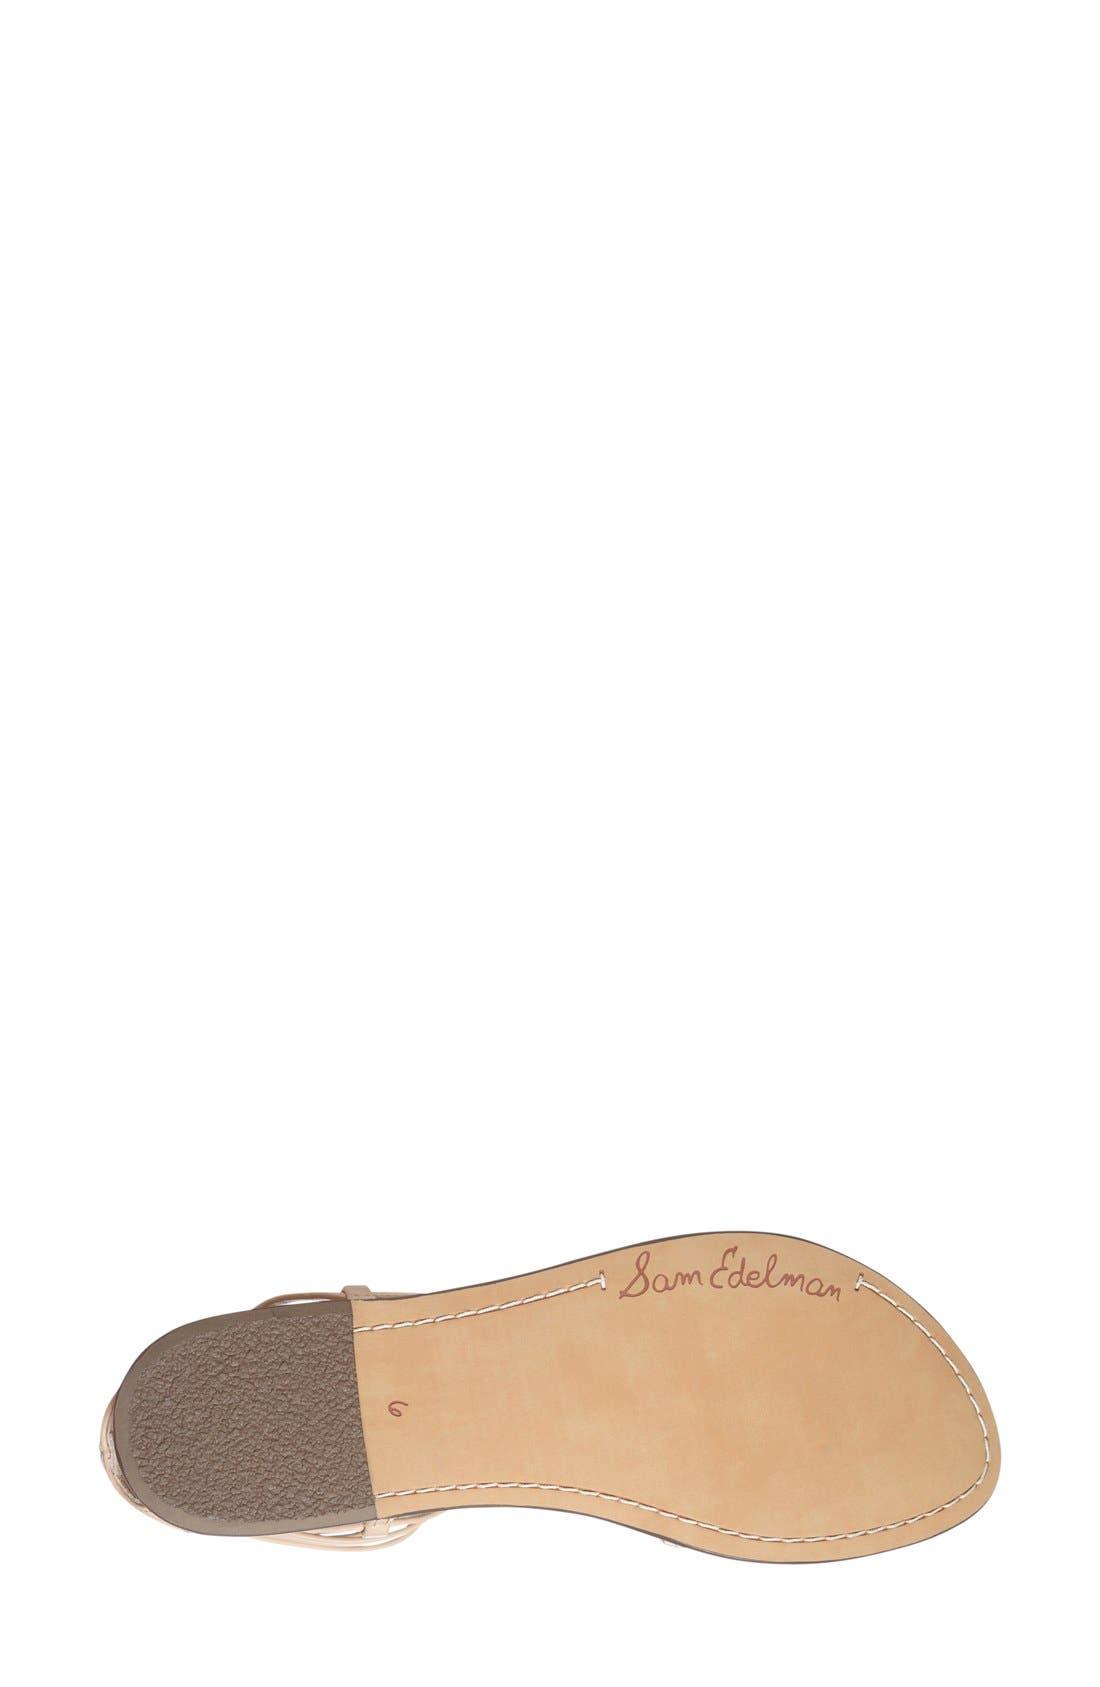 'Ginette' Sandal,                             Alternate thumbnail 4, color,                             Natural Naked Leather